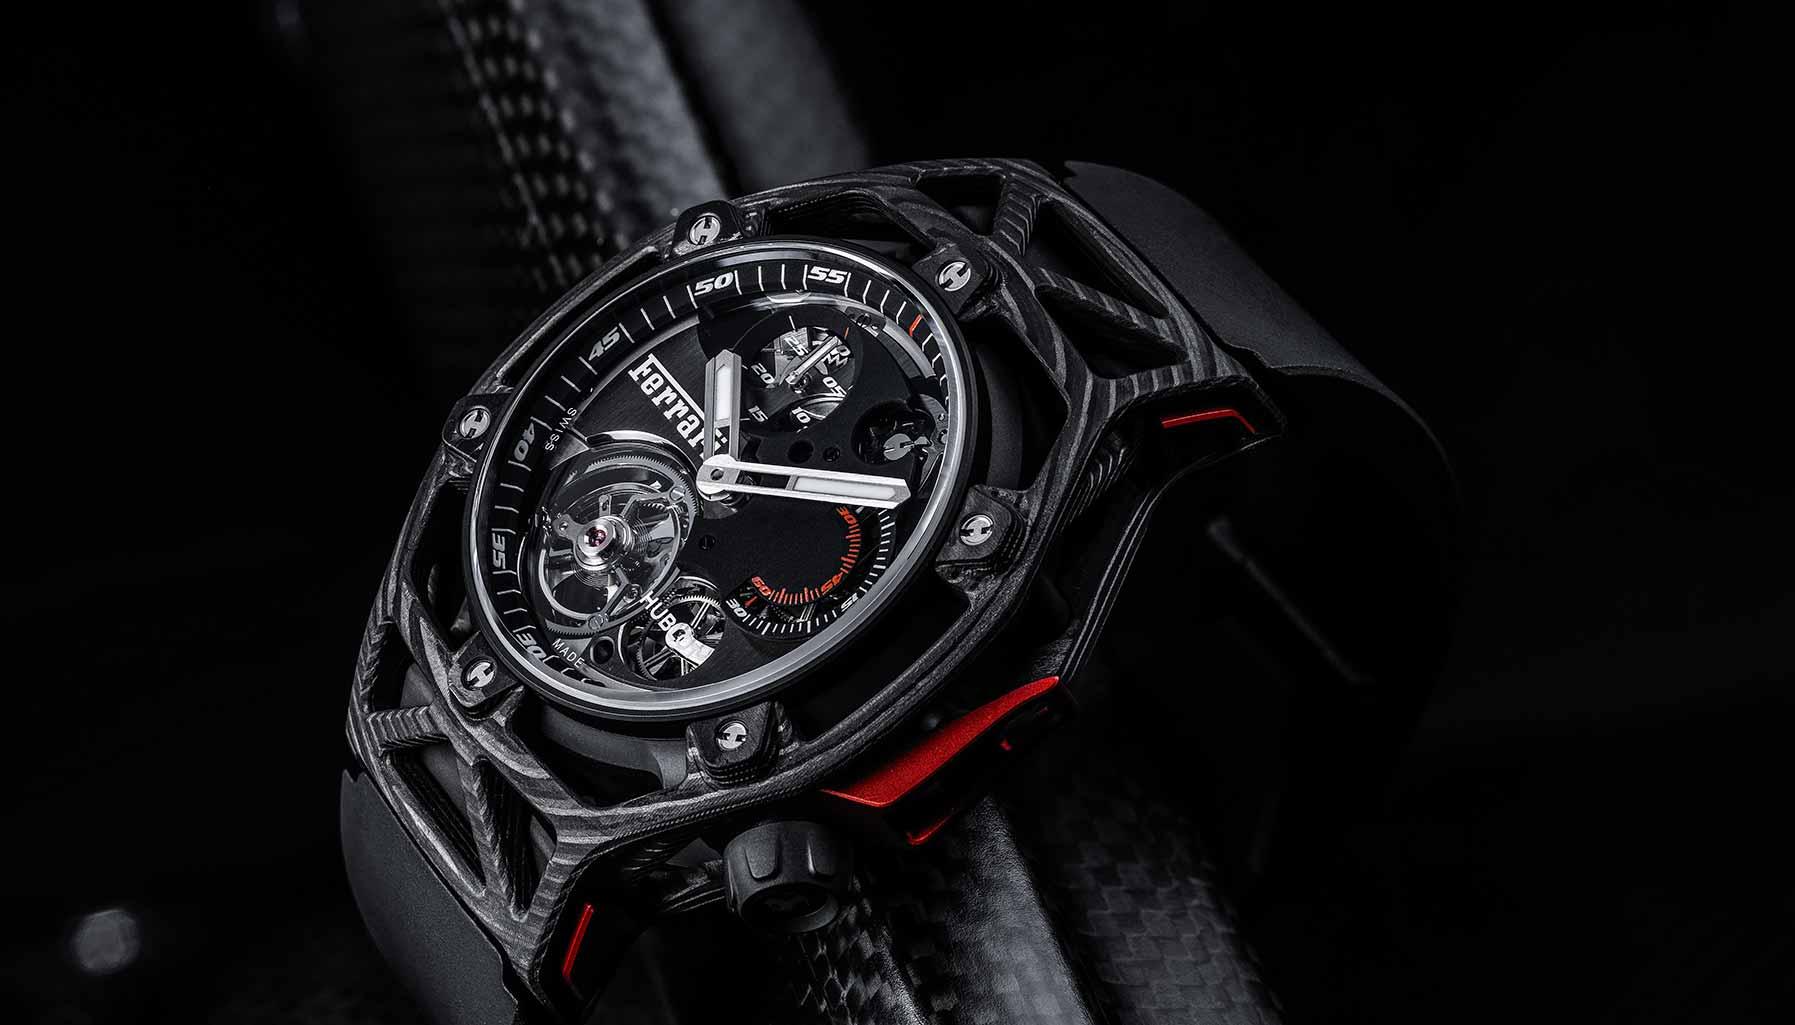 Hublot X Ferrari watch